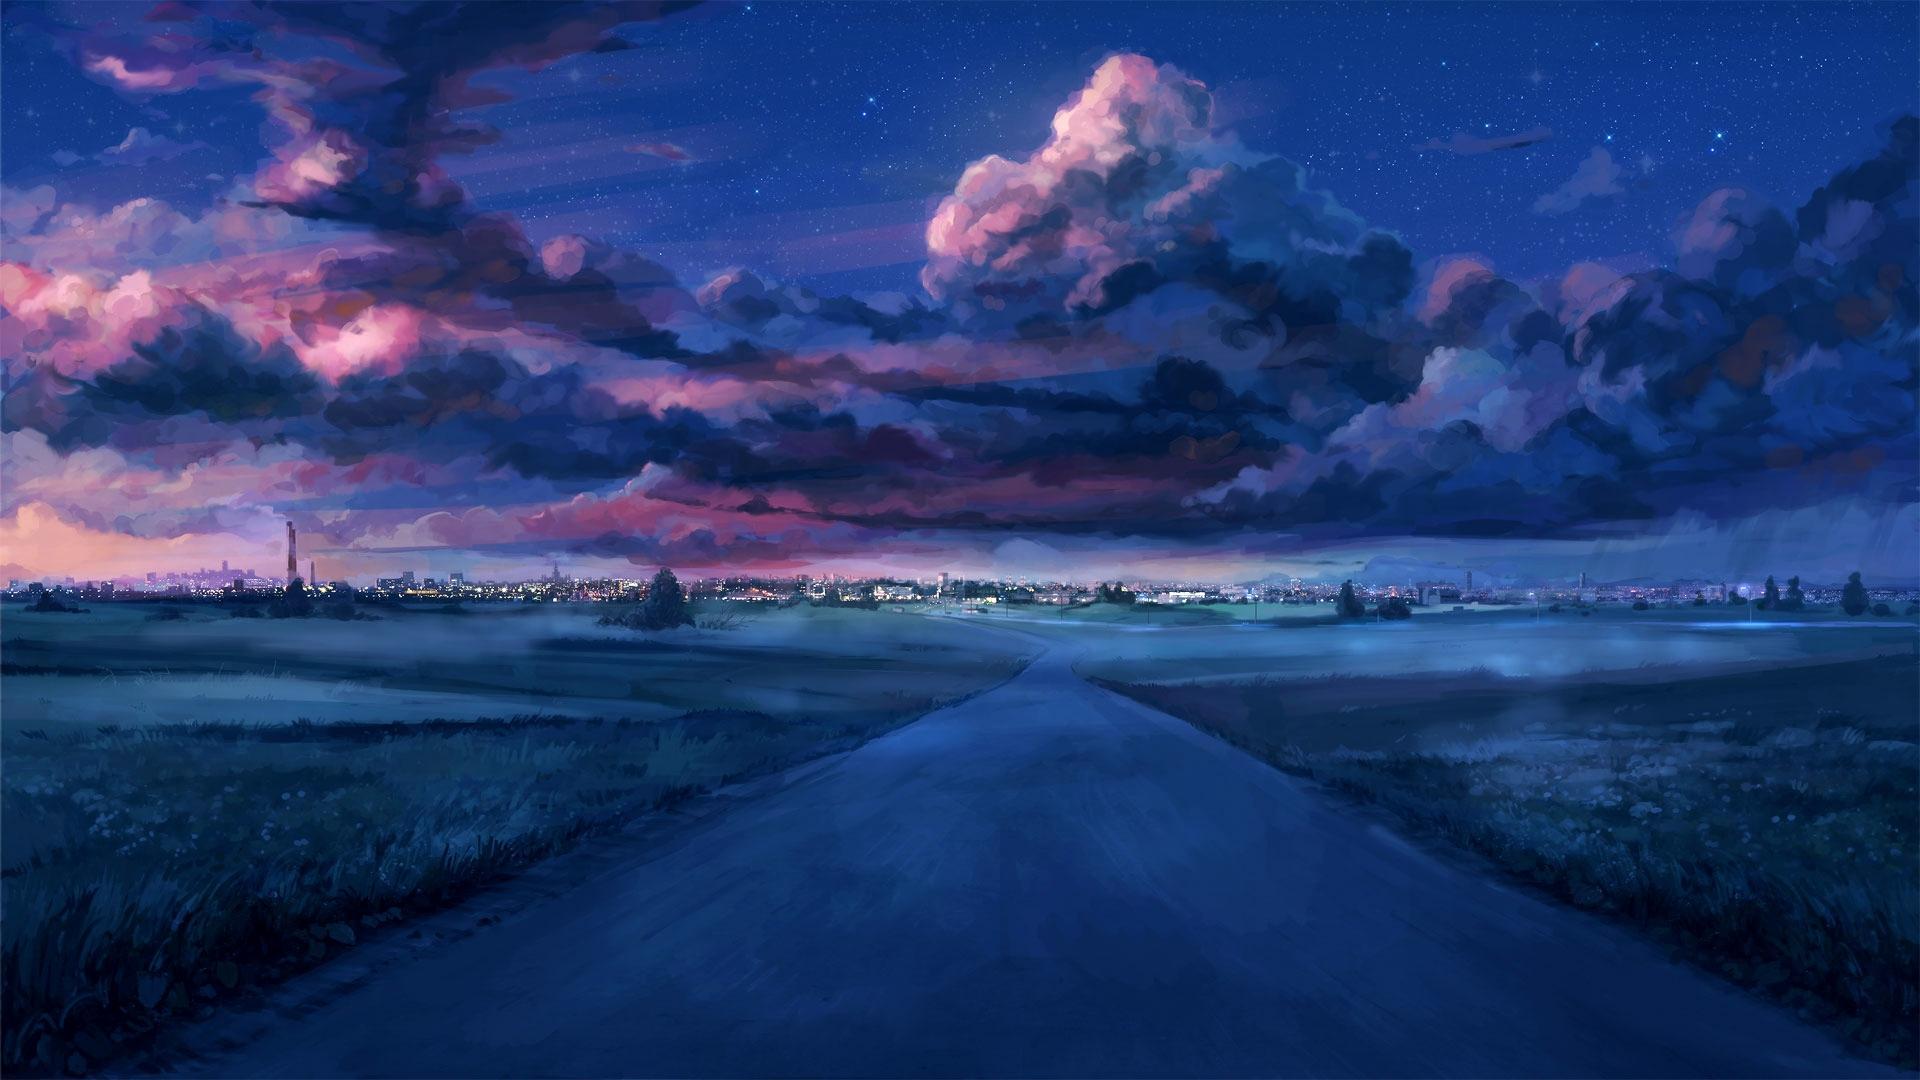 Landscape Scene Anime 4k Wallpapers - Wallpaper Cave